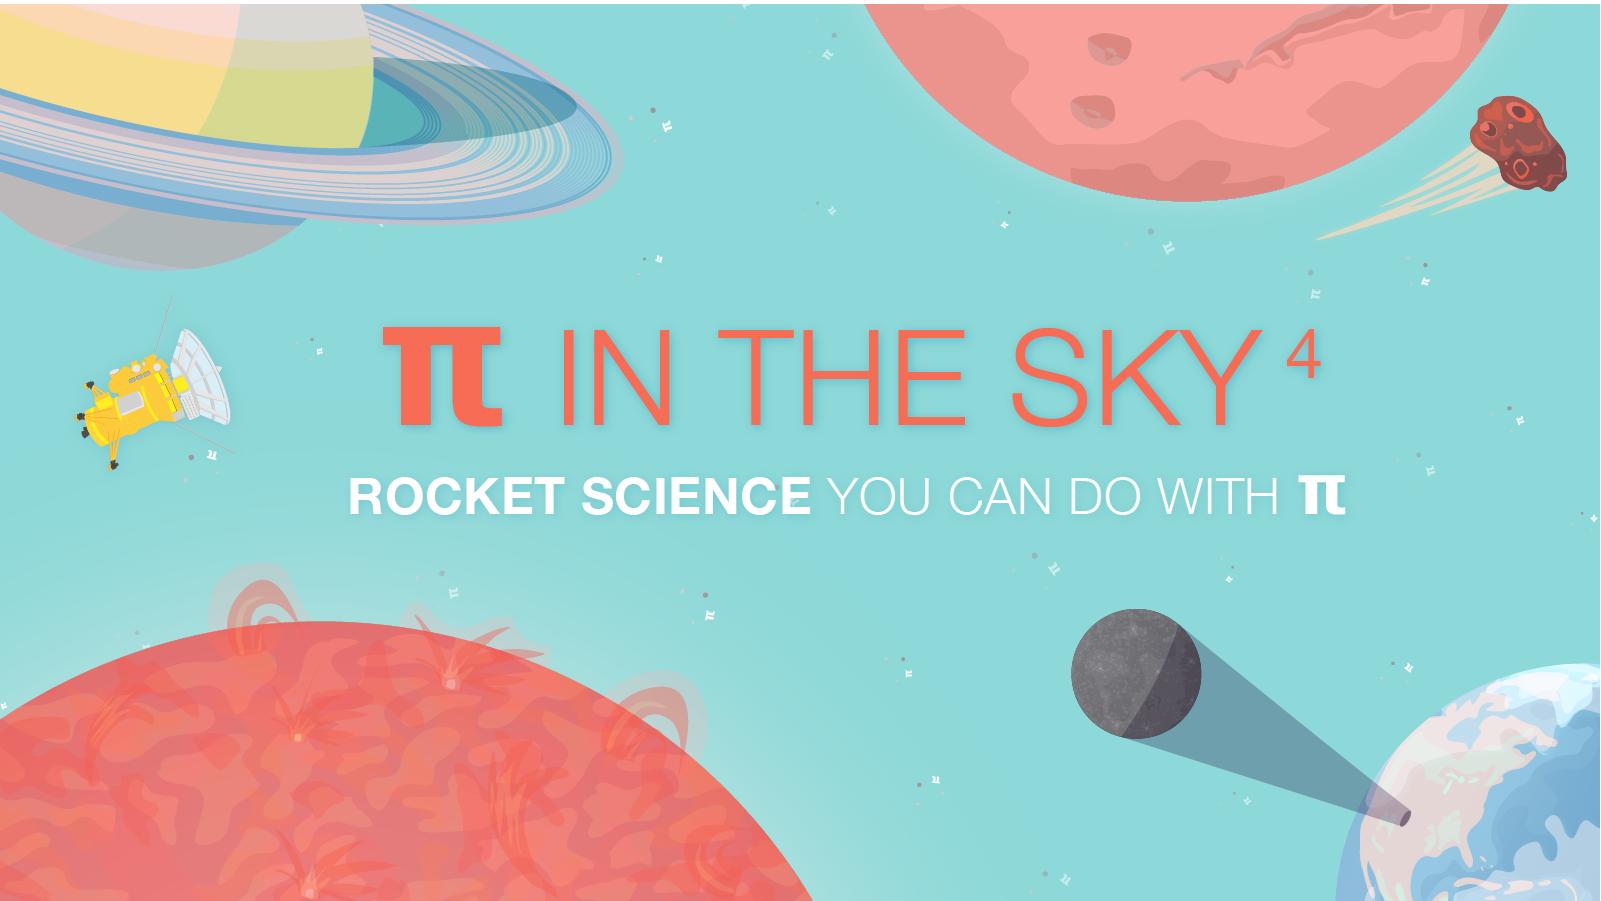 Pi in the Sky 4 Activity | NASA/JPL Edu